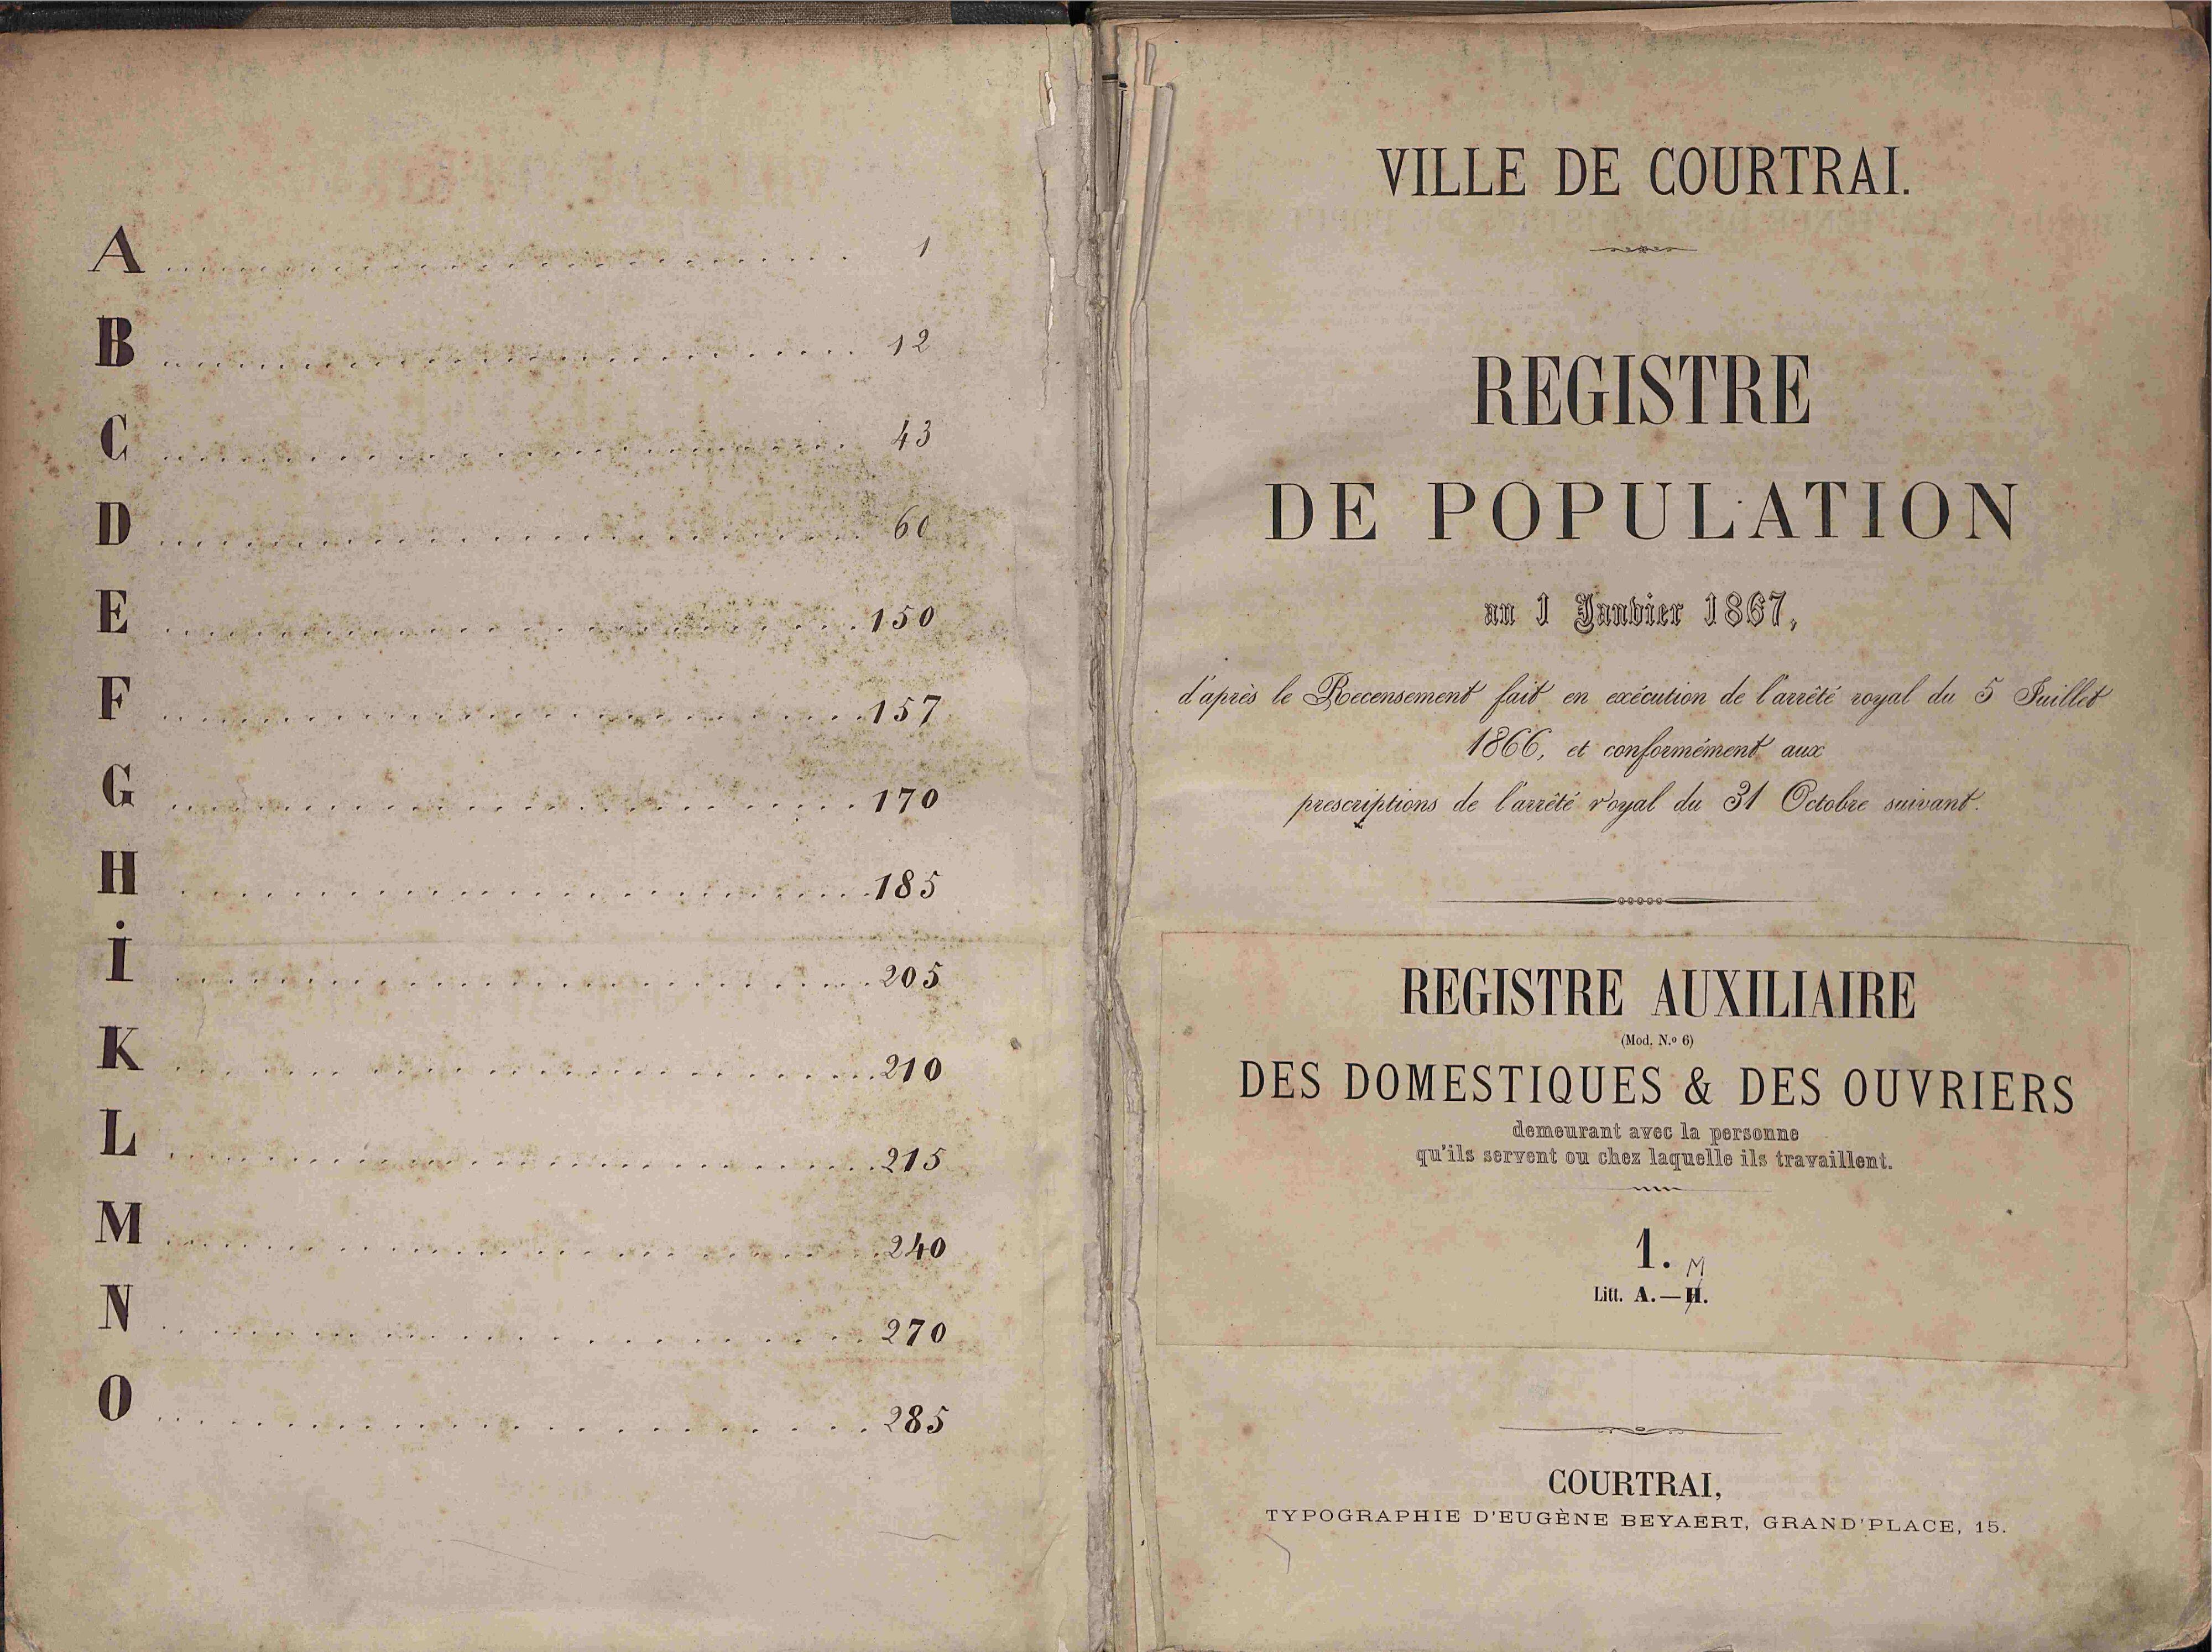 Bevolkingsregister Kortrijk 1866 AUX1